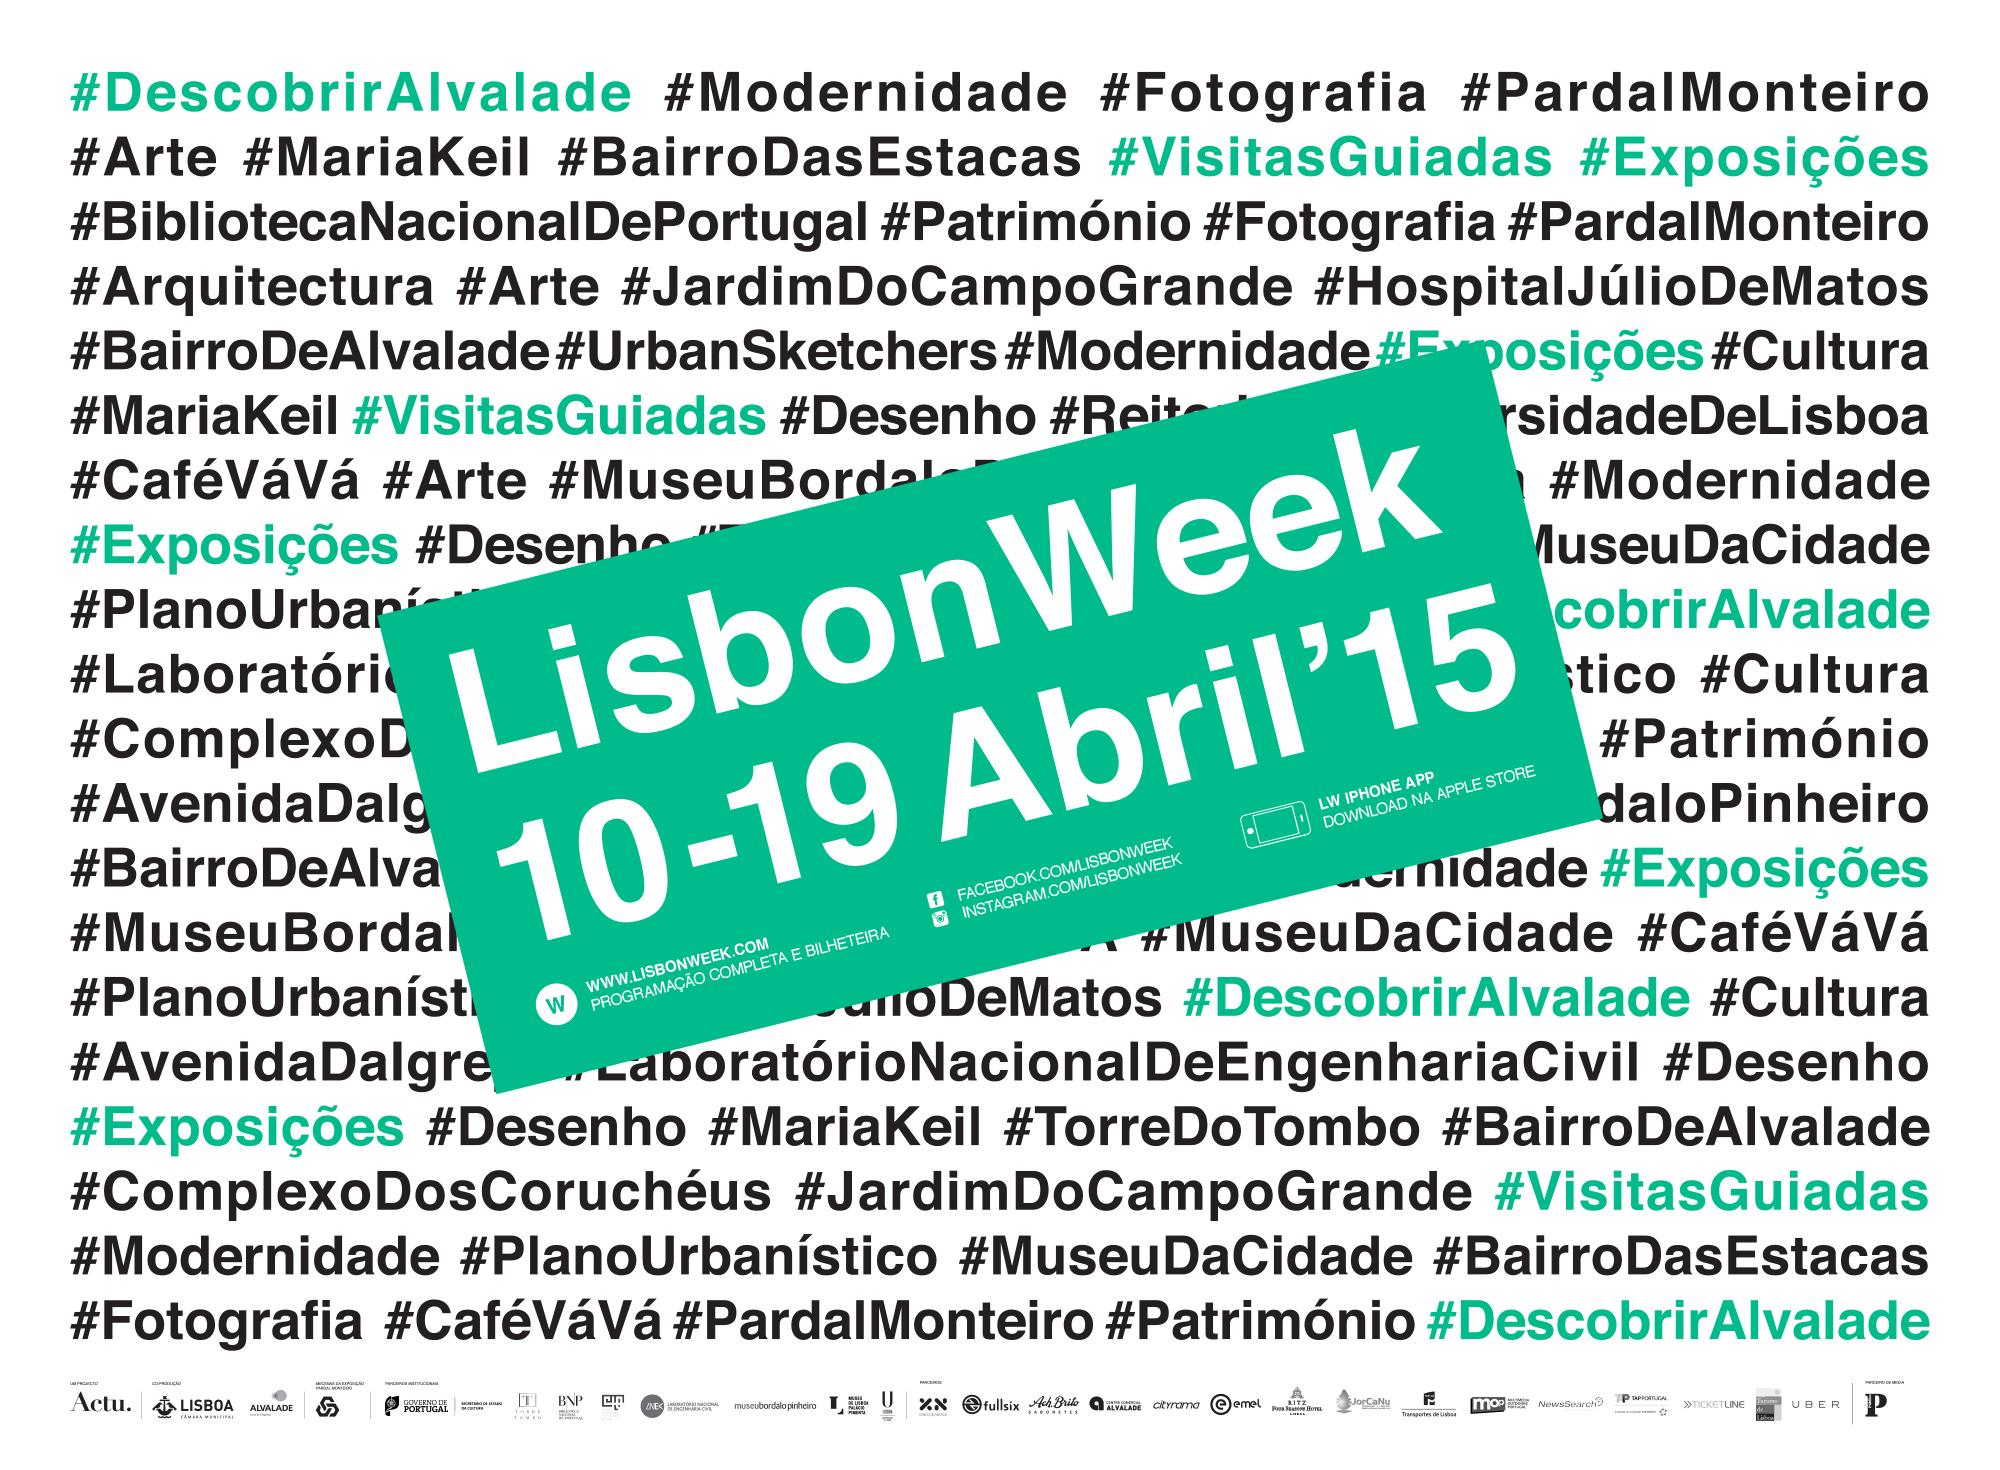 lisbonweek15